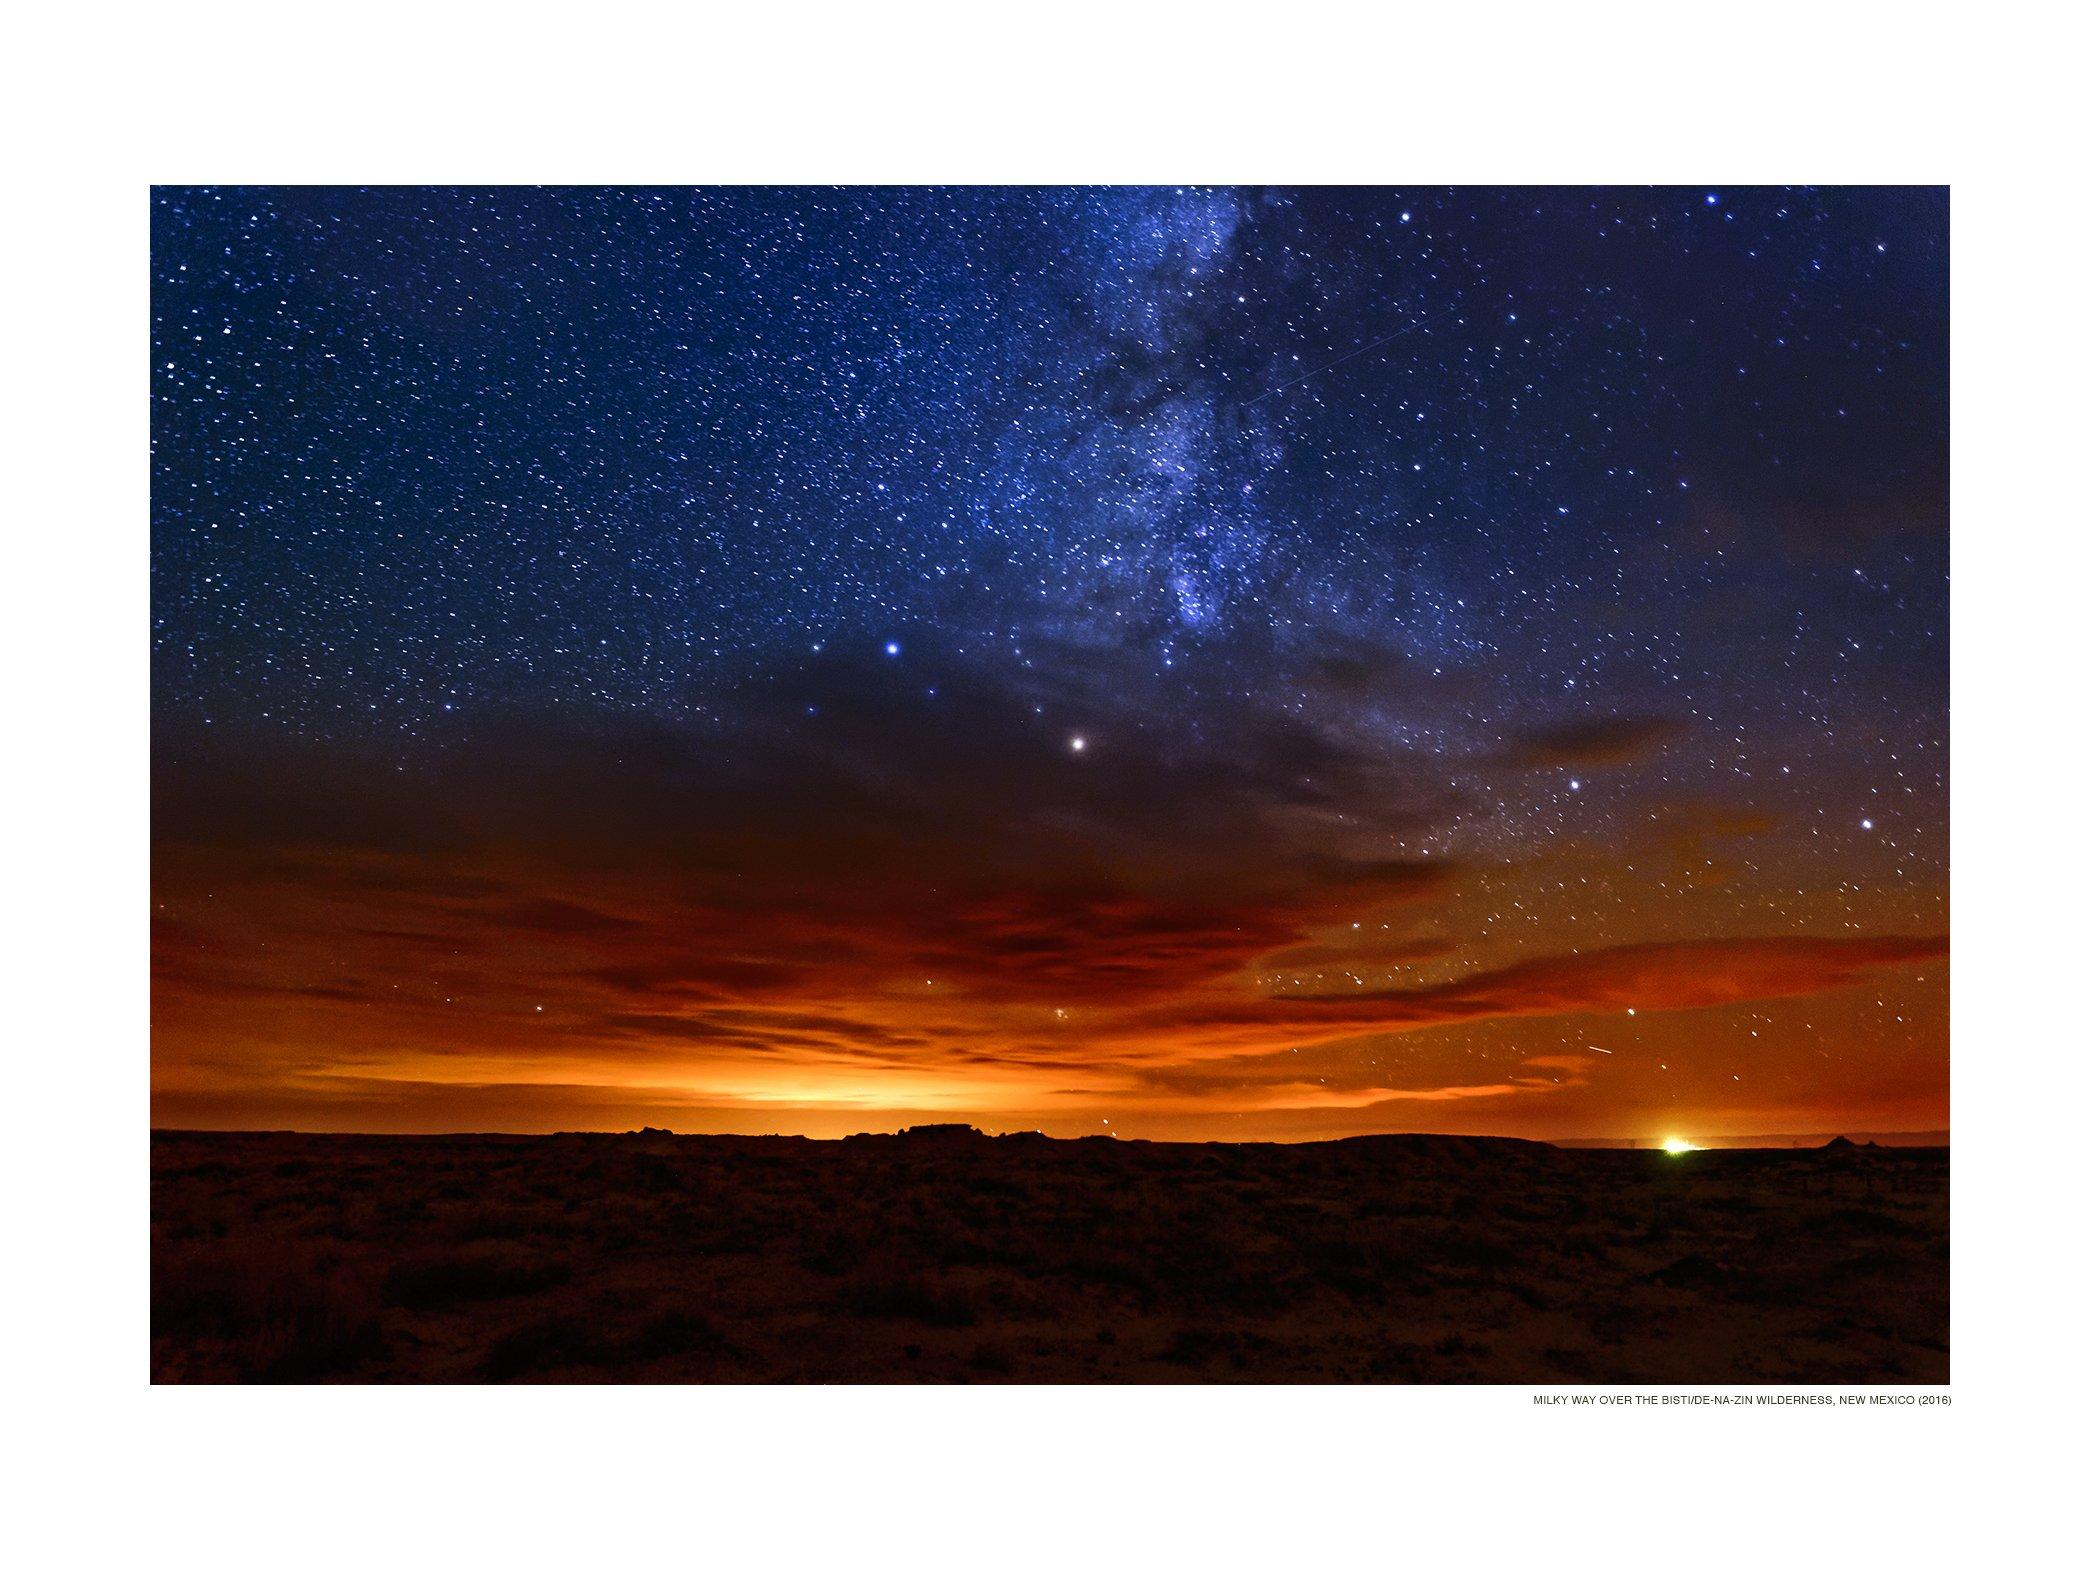 Milky Way over the Bisti/De-Na-Zin Wilderness, San Juan County, New Mexico (2016)